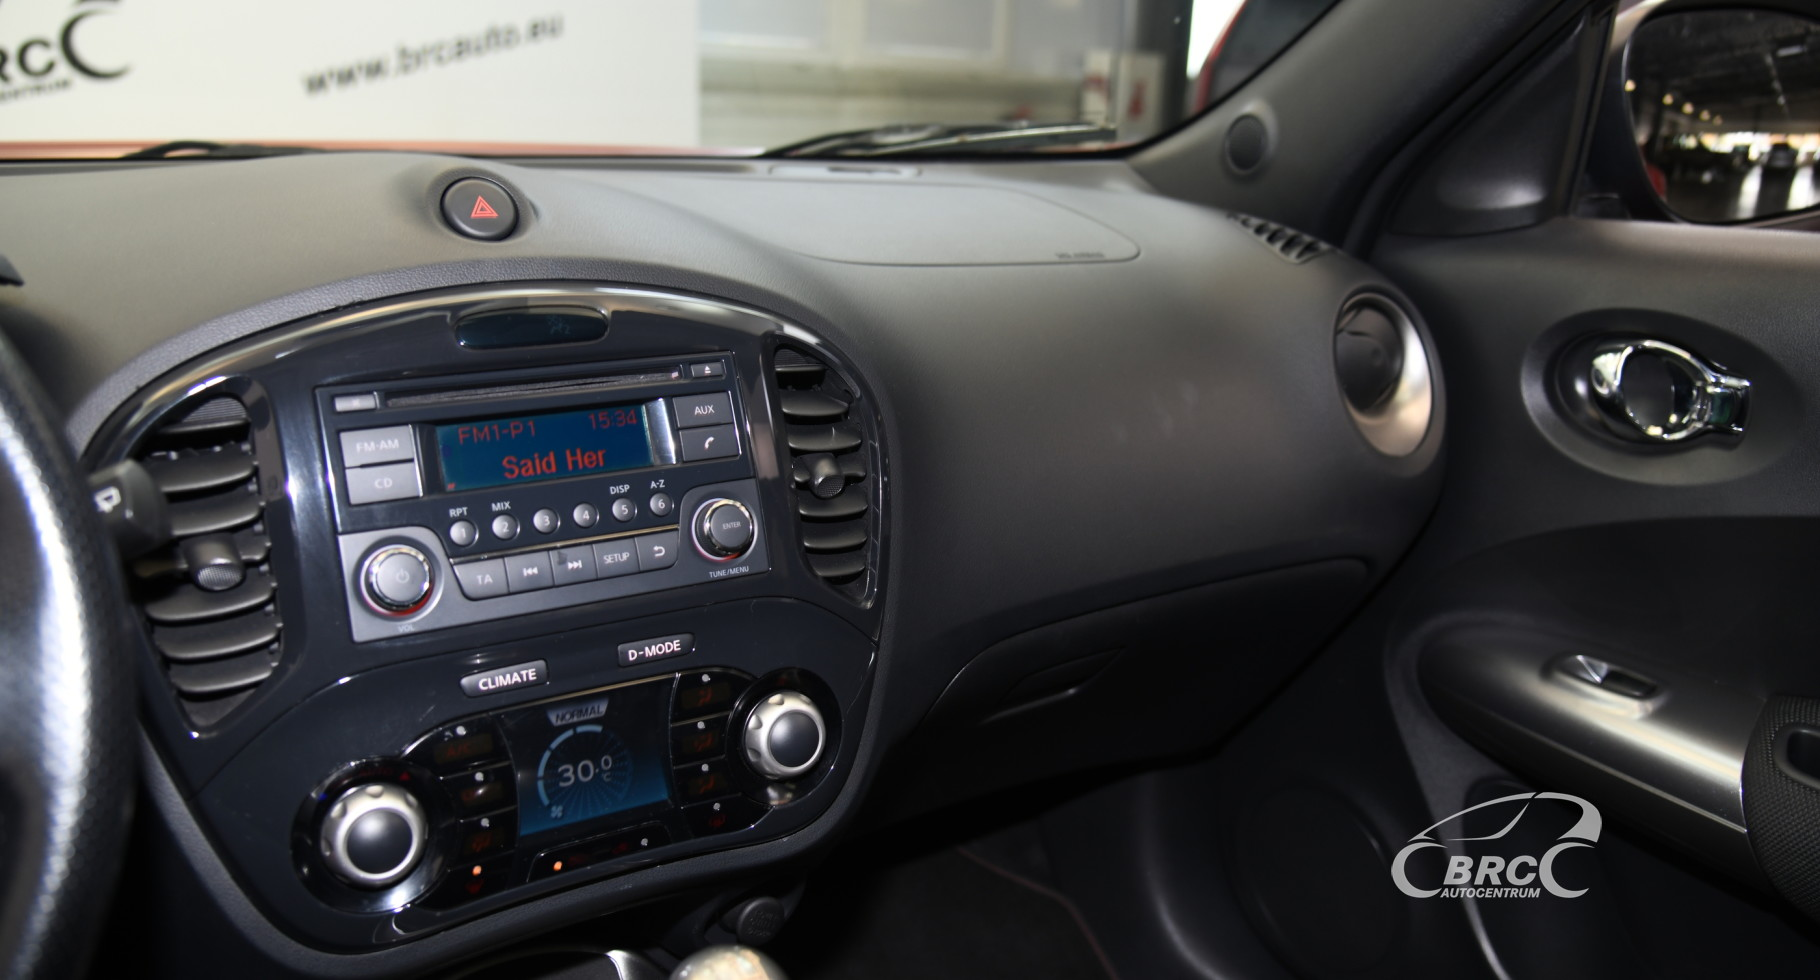 Nissan Juke 1.6 i 2WD PureDrive